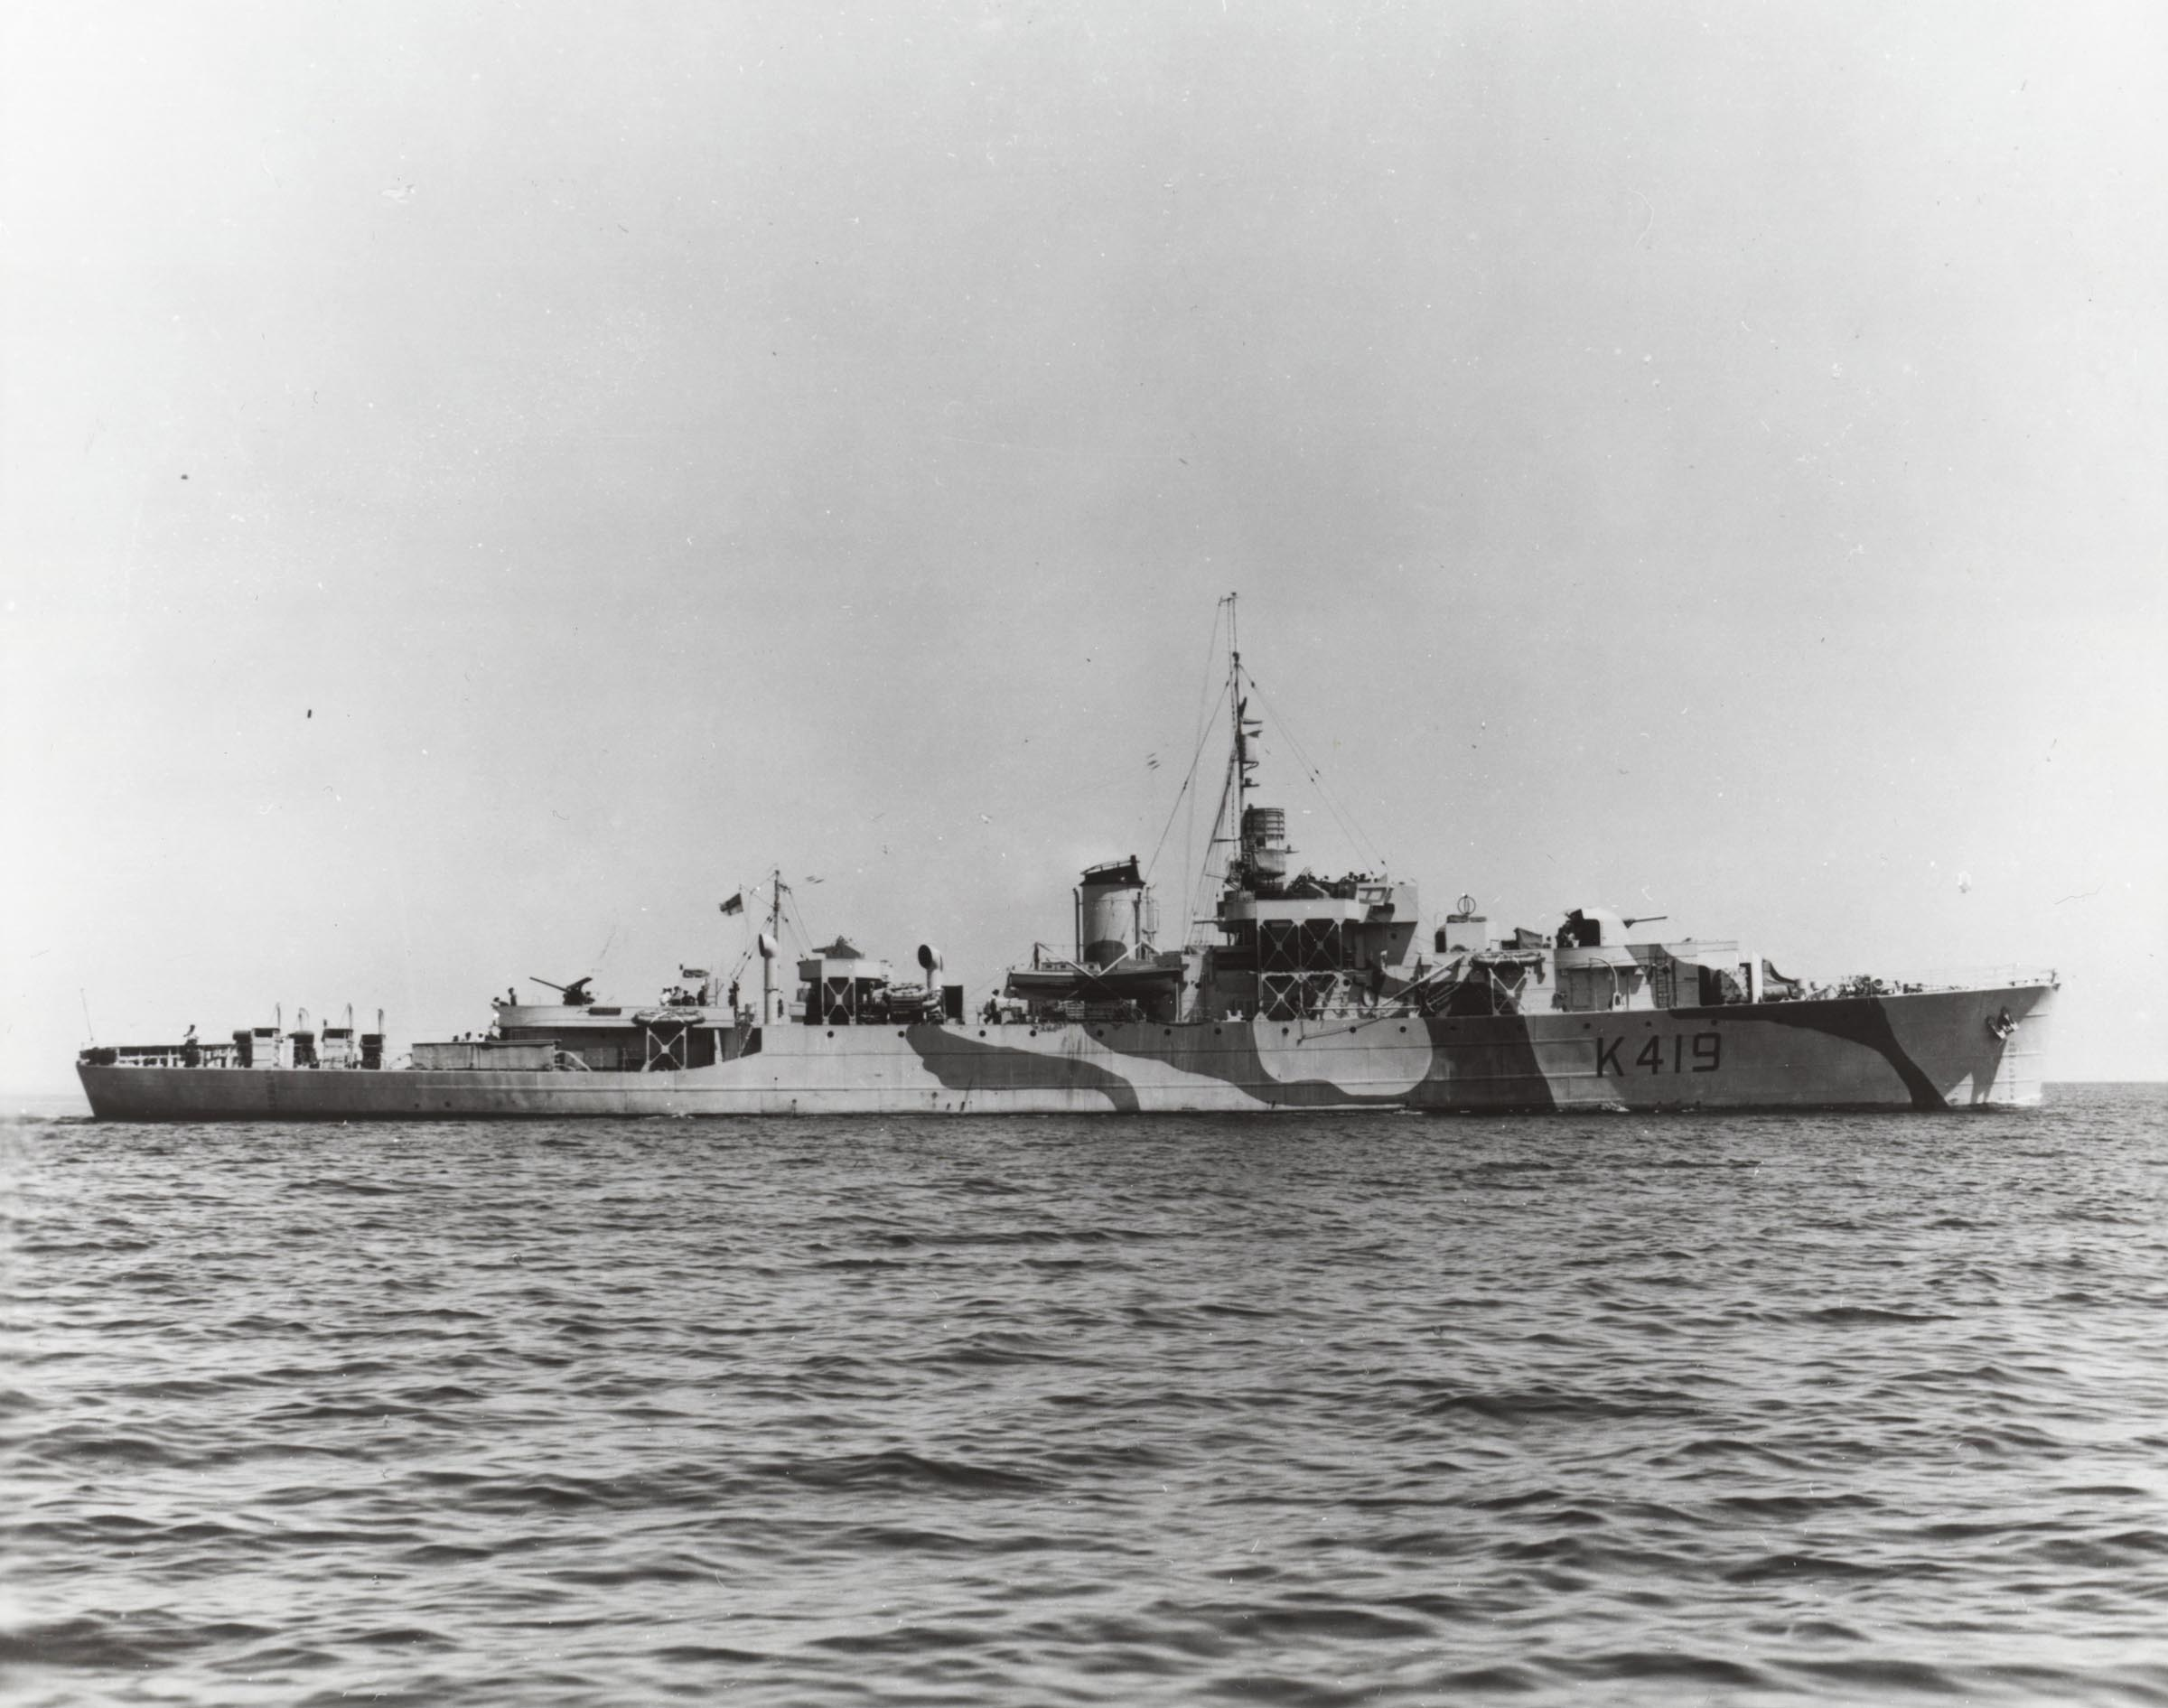 HMCS KOKANEE